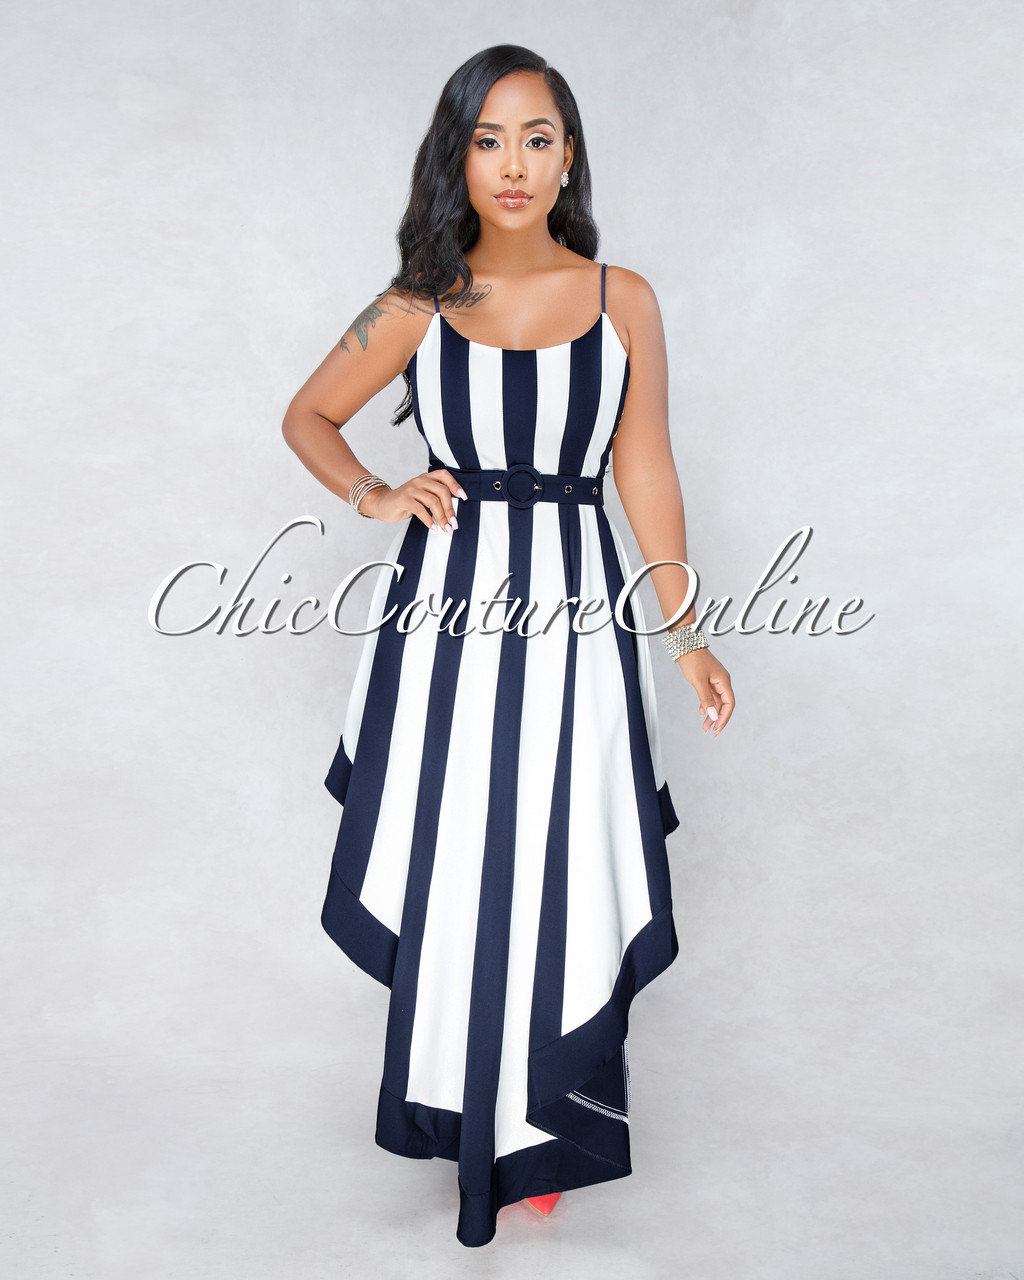 4667dbdecf26 Dalis Off-White Navy Blue Stripes High-Low Belt Dress